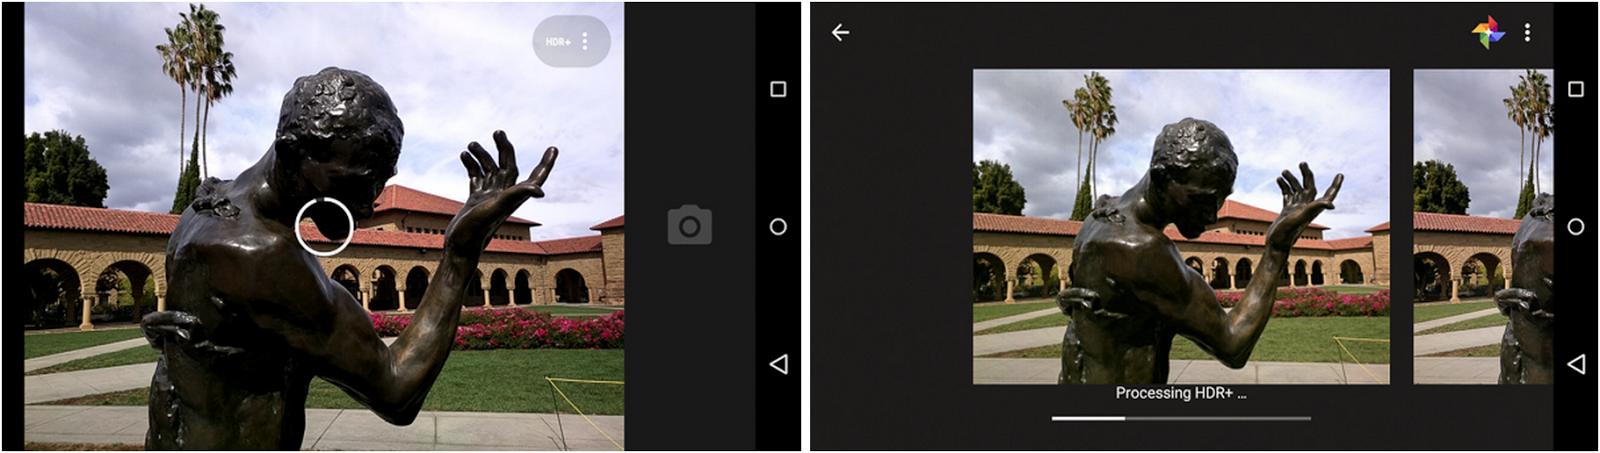 Google AI Blog: HDR+: Low Light and High Dynamic Range